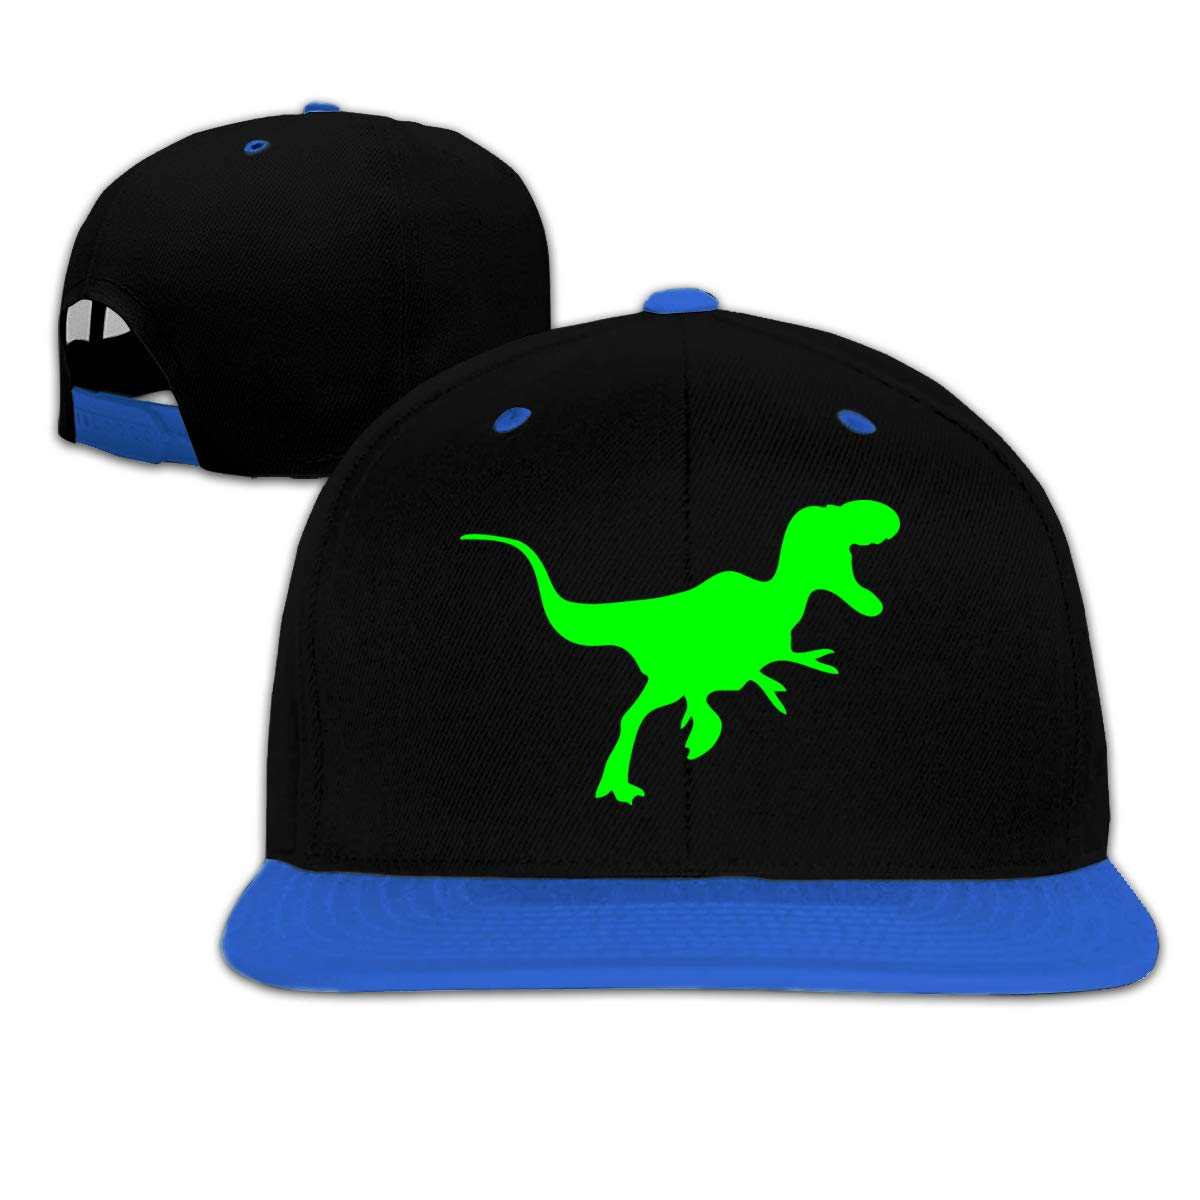 c5cb6efb48d3e5 Amazon.com: Sfspo Pp Black Big Hip Hop Caps Cotton Baseball Hat Green  Dinosaur Boy&Girl: Clothing